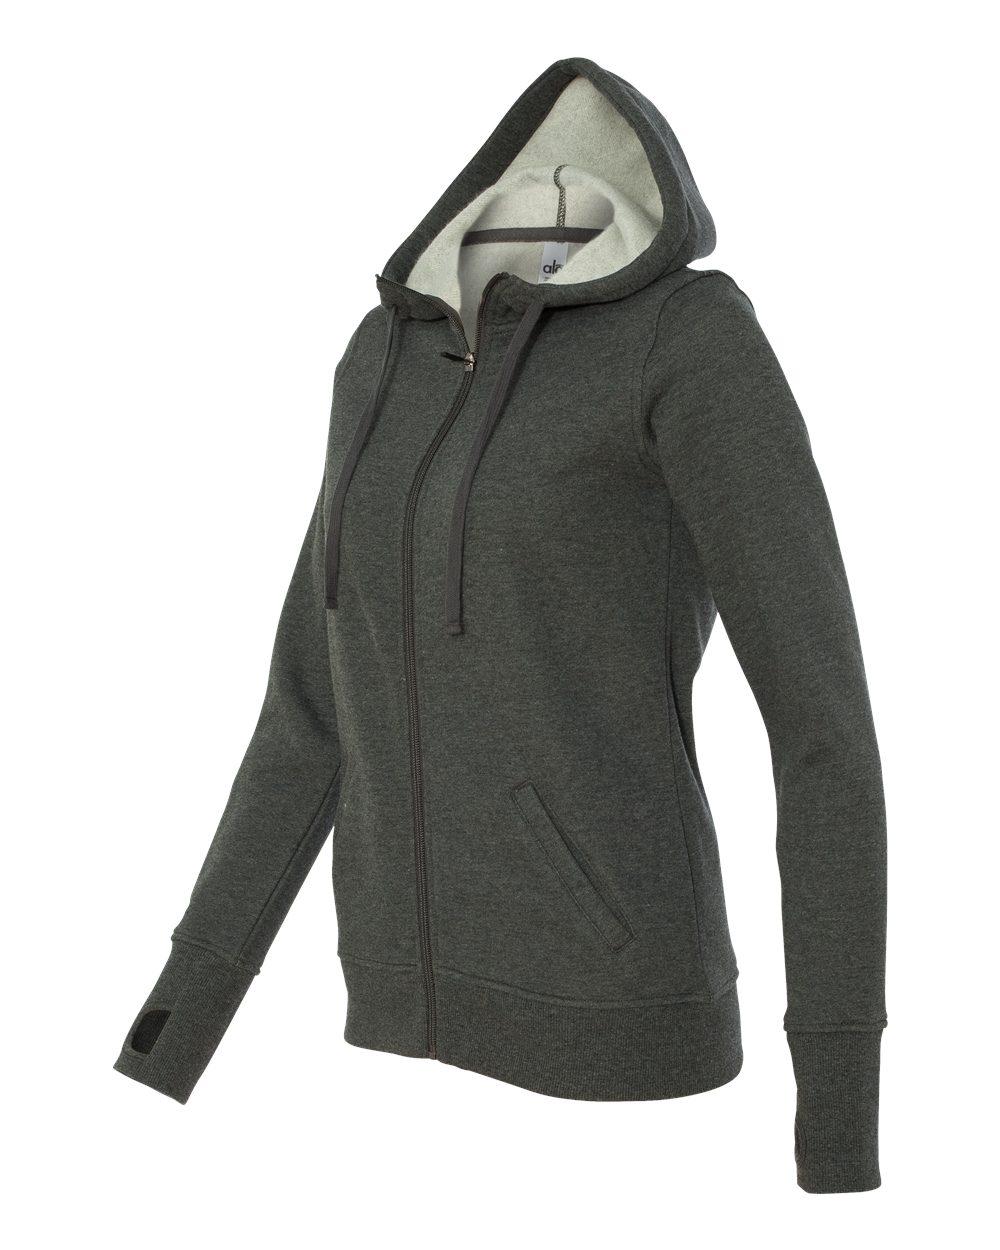 alo - Ladies' Performance Fleece Hooded Full-Zip